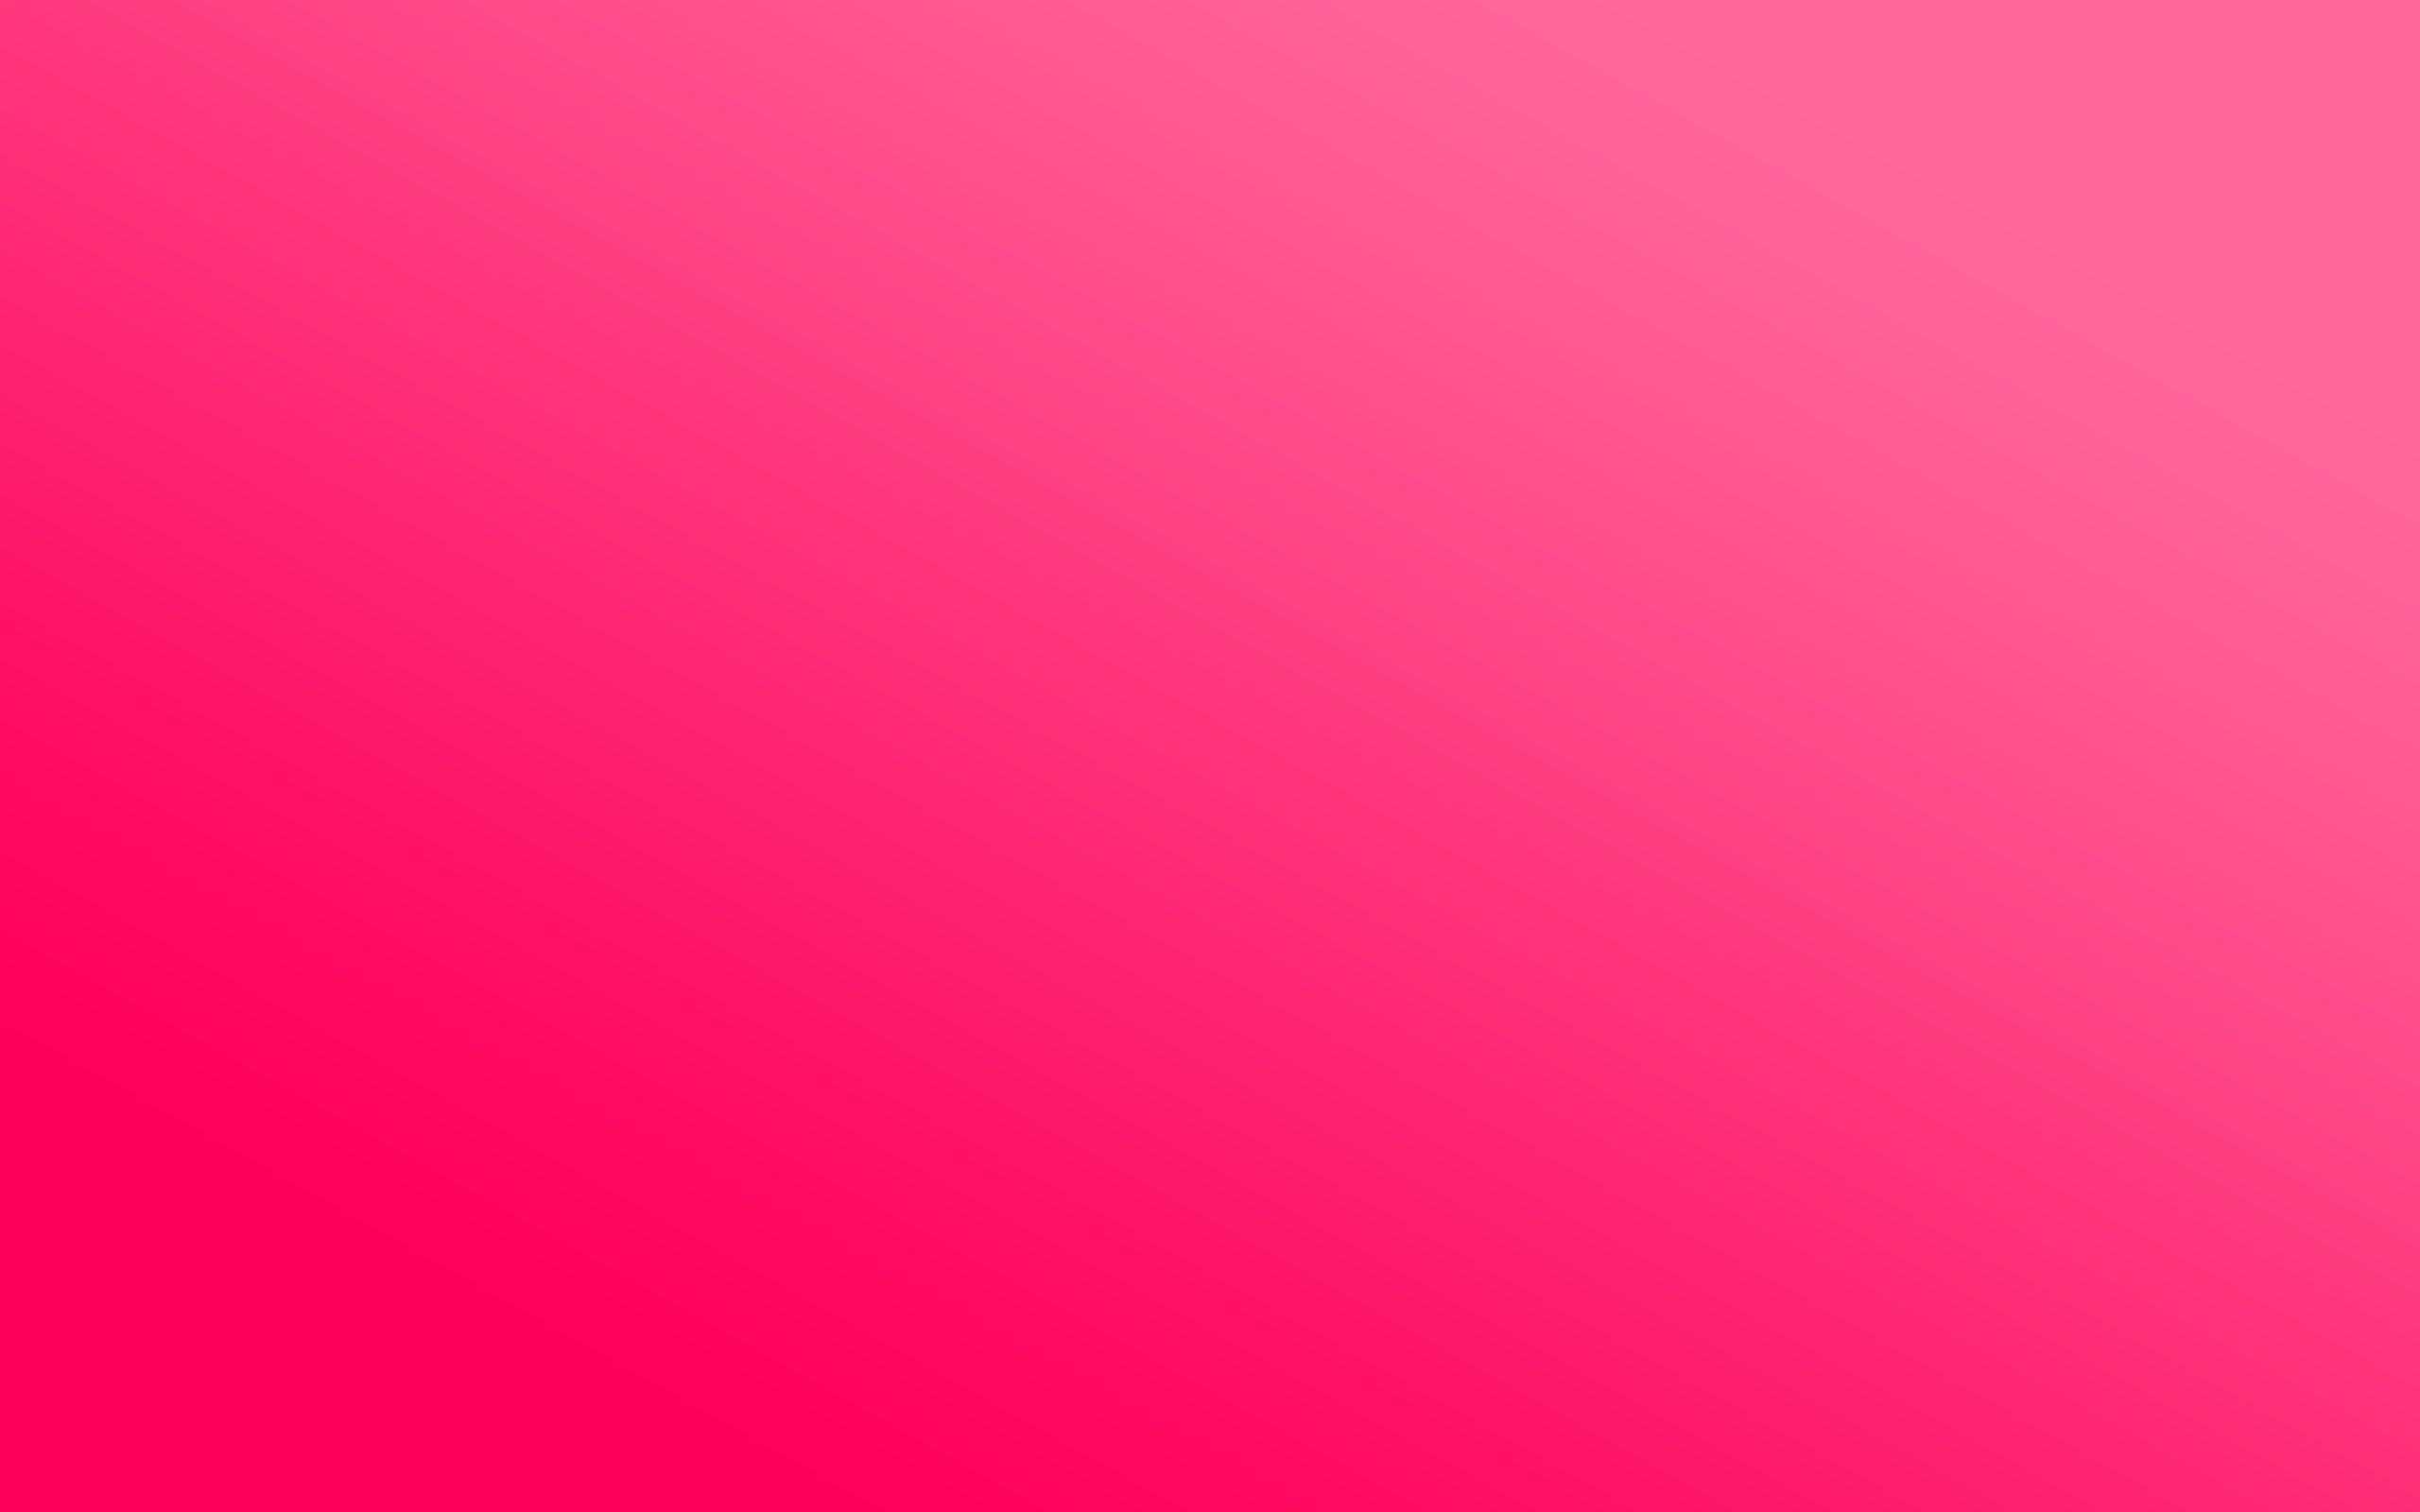 Pink Colour Backgrounds - Wallpaper Cave |Plain Pink Backgrounds